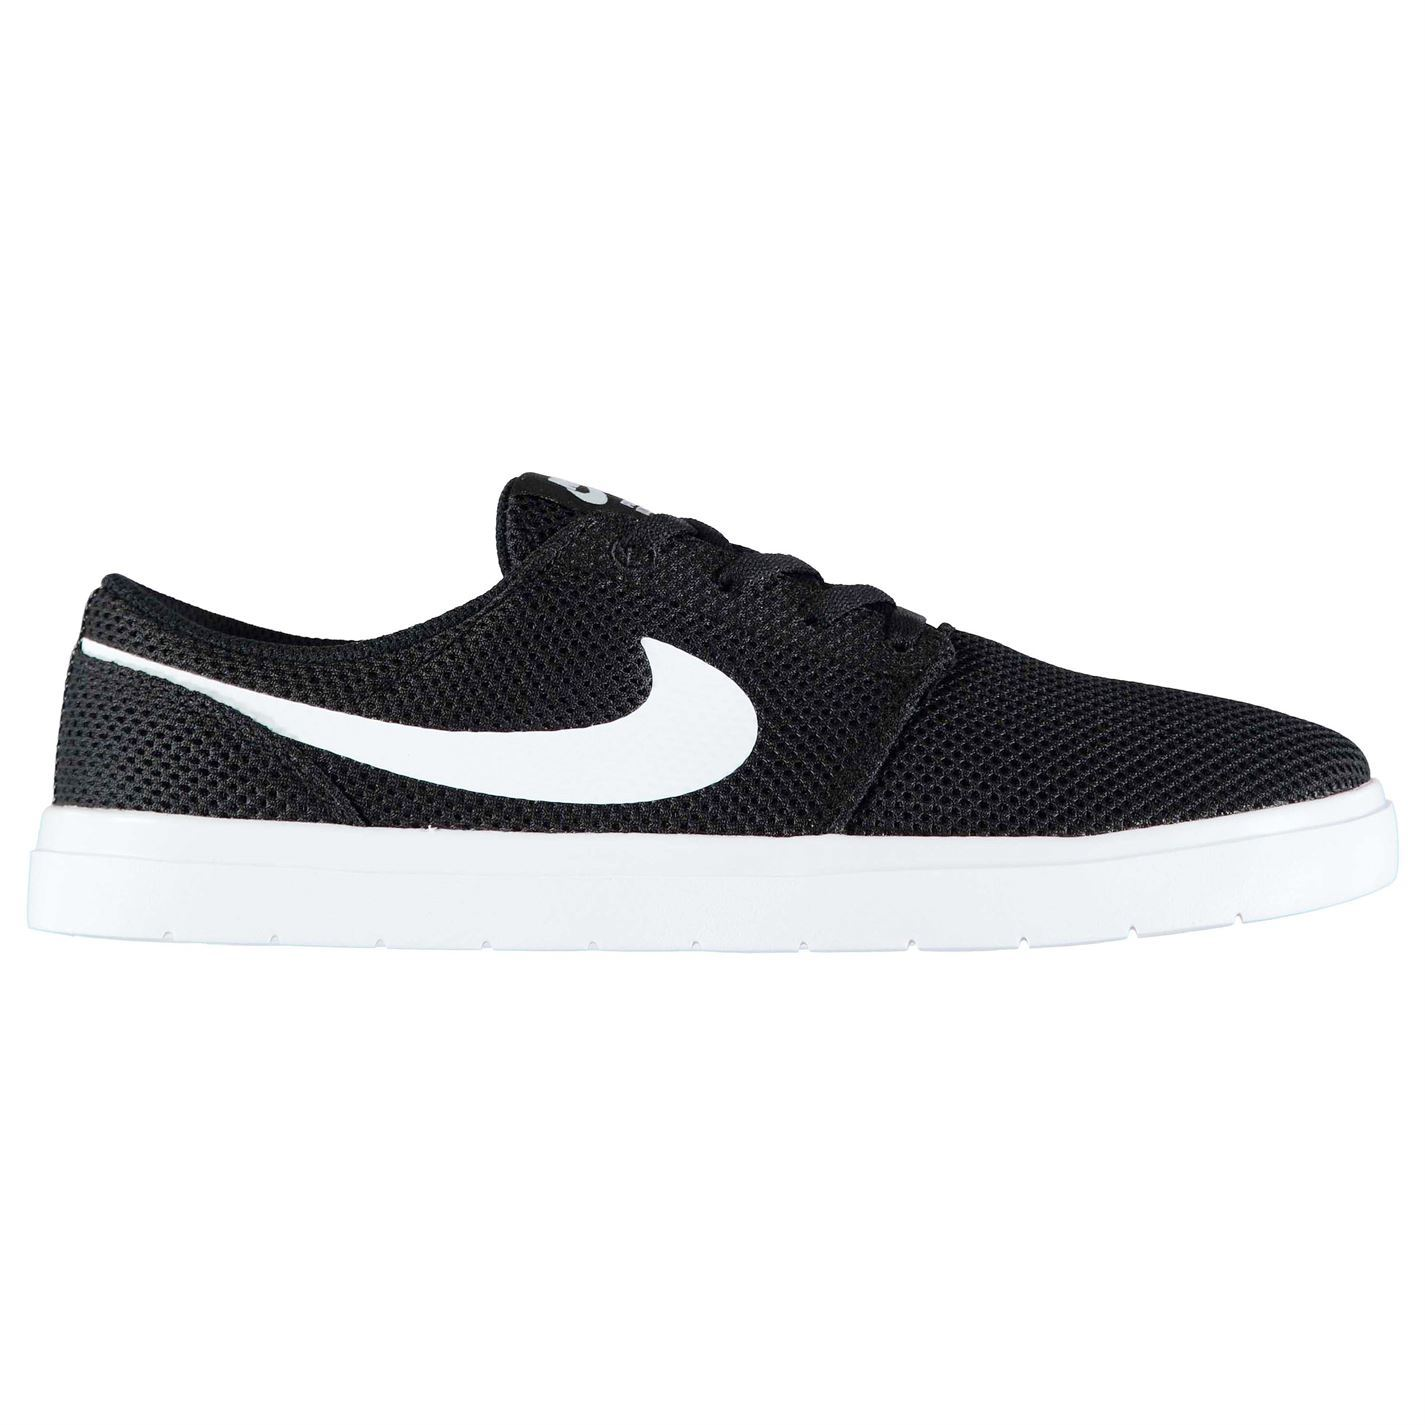 on sale 644f7 1b436 Nike SB Portmore II Ultralight Skate Shoes Mens Black White Trainers  Sneakers